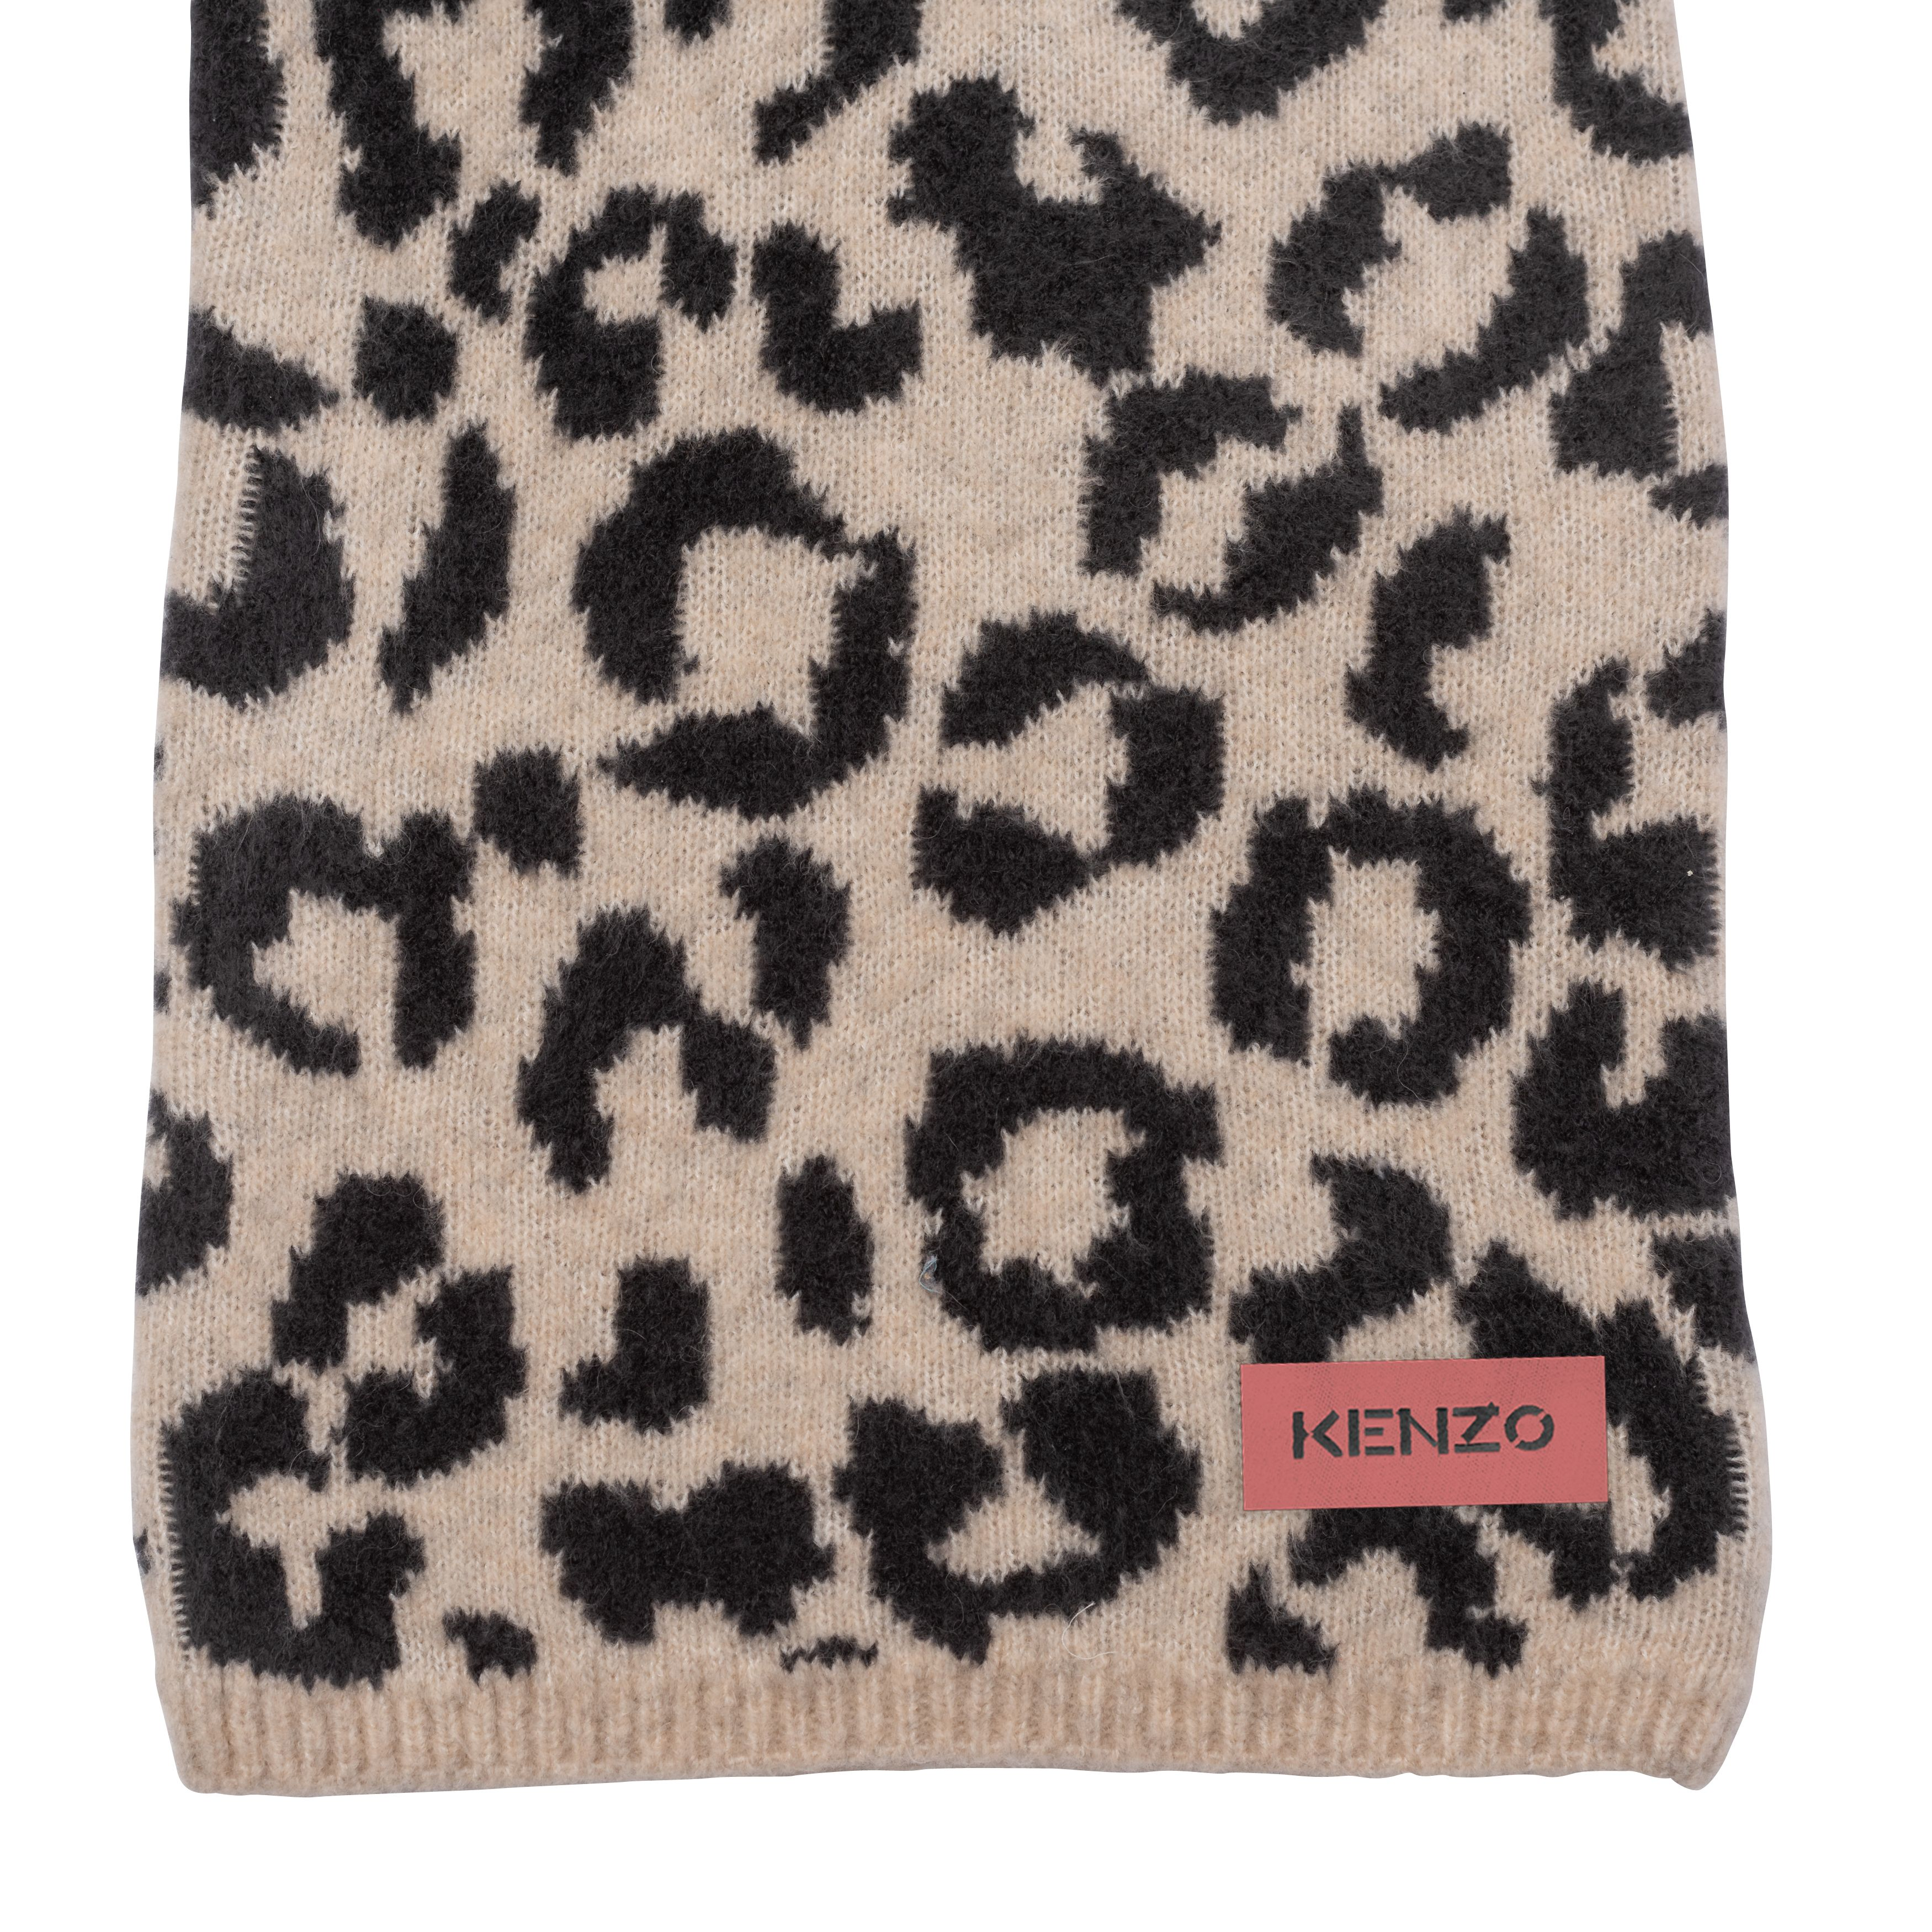 Wool-blend knit pants KENZO KIDS for GIRL